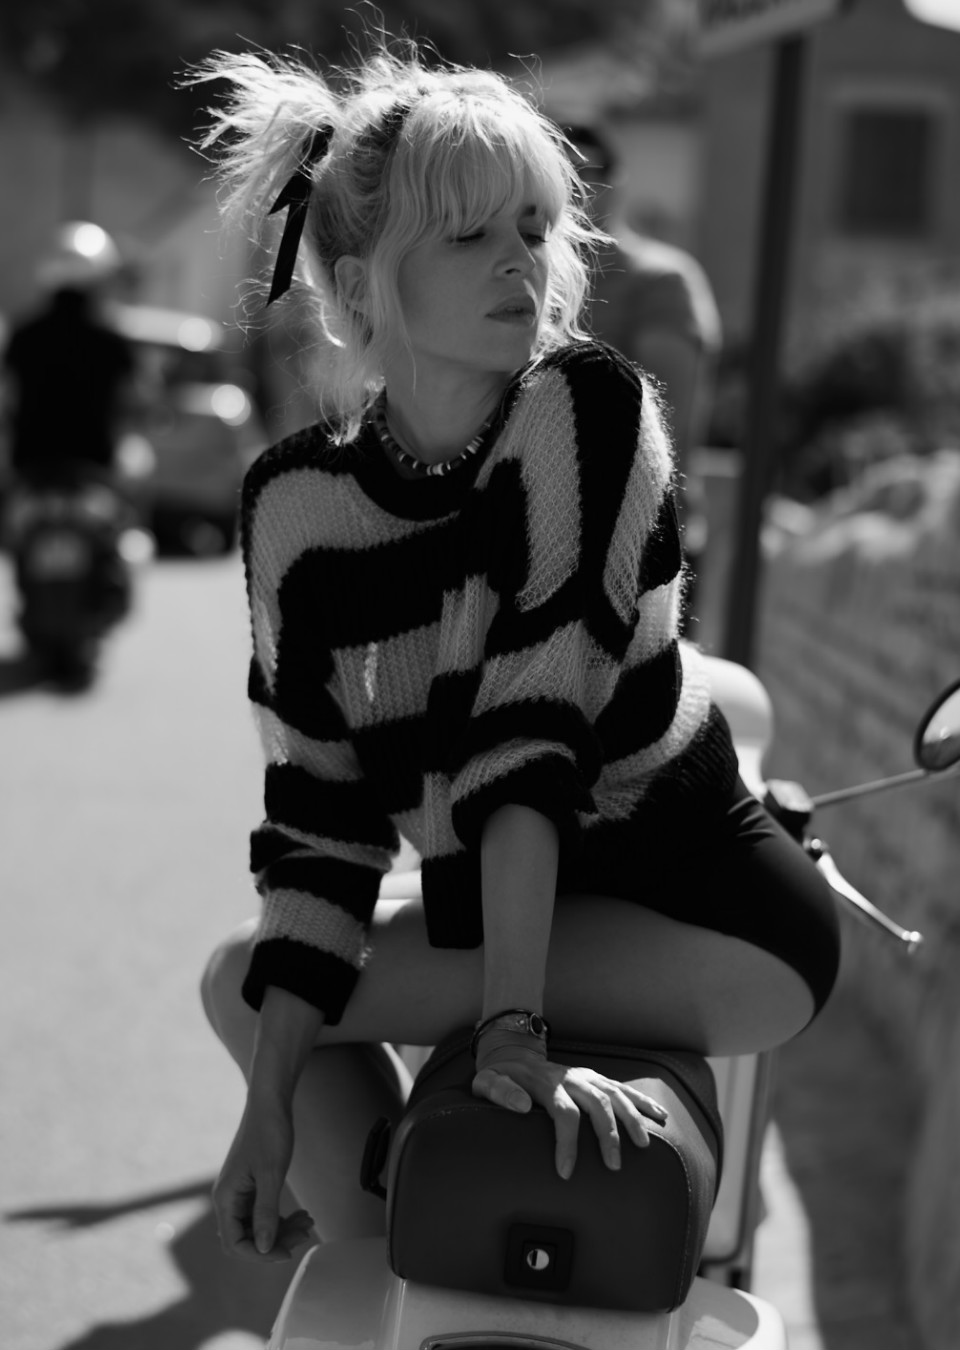 SAFE MGMT Management Paris - Cécile Cassel aka Hollysiz